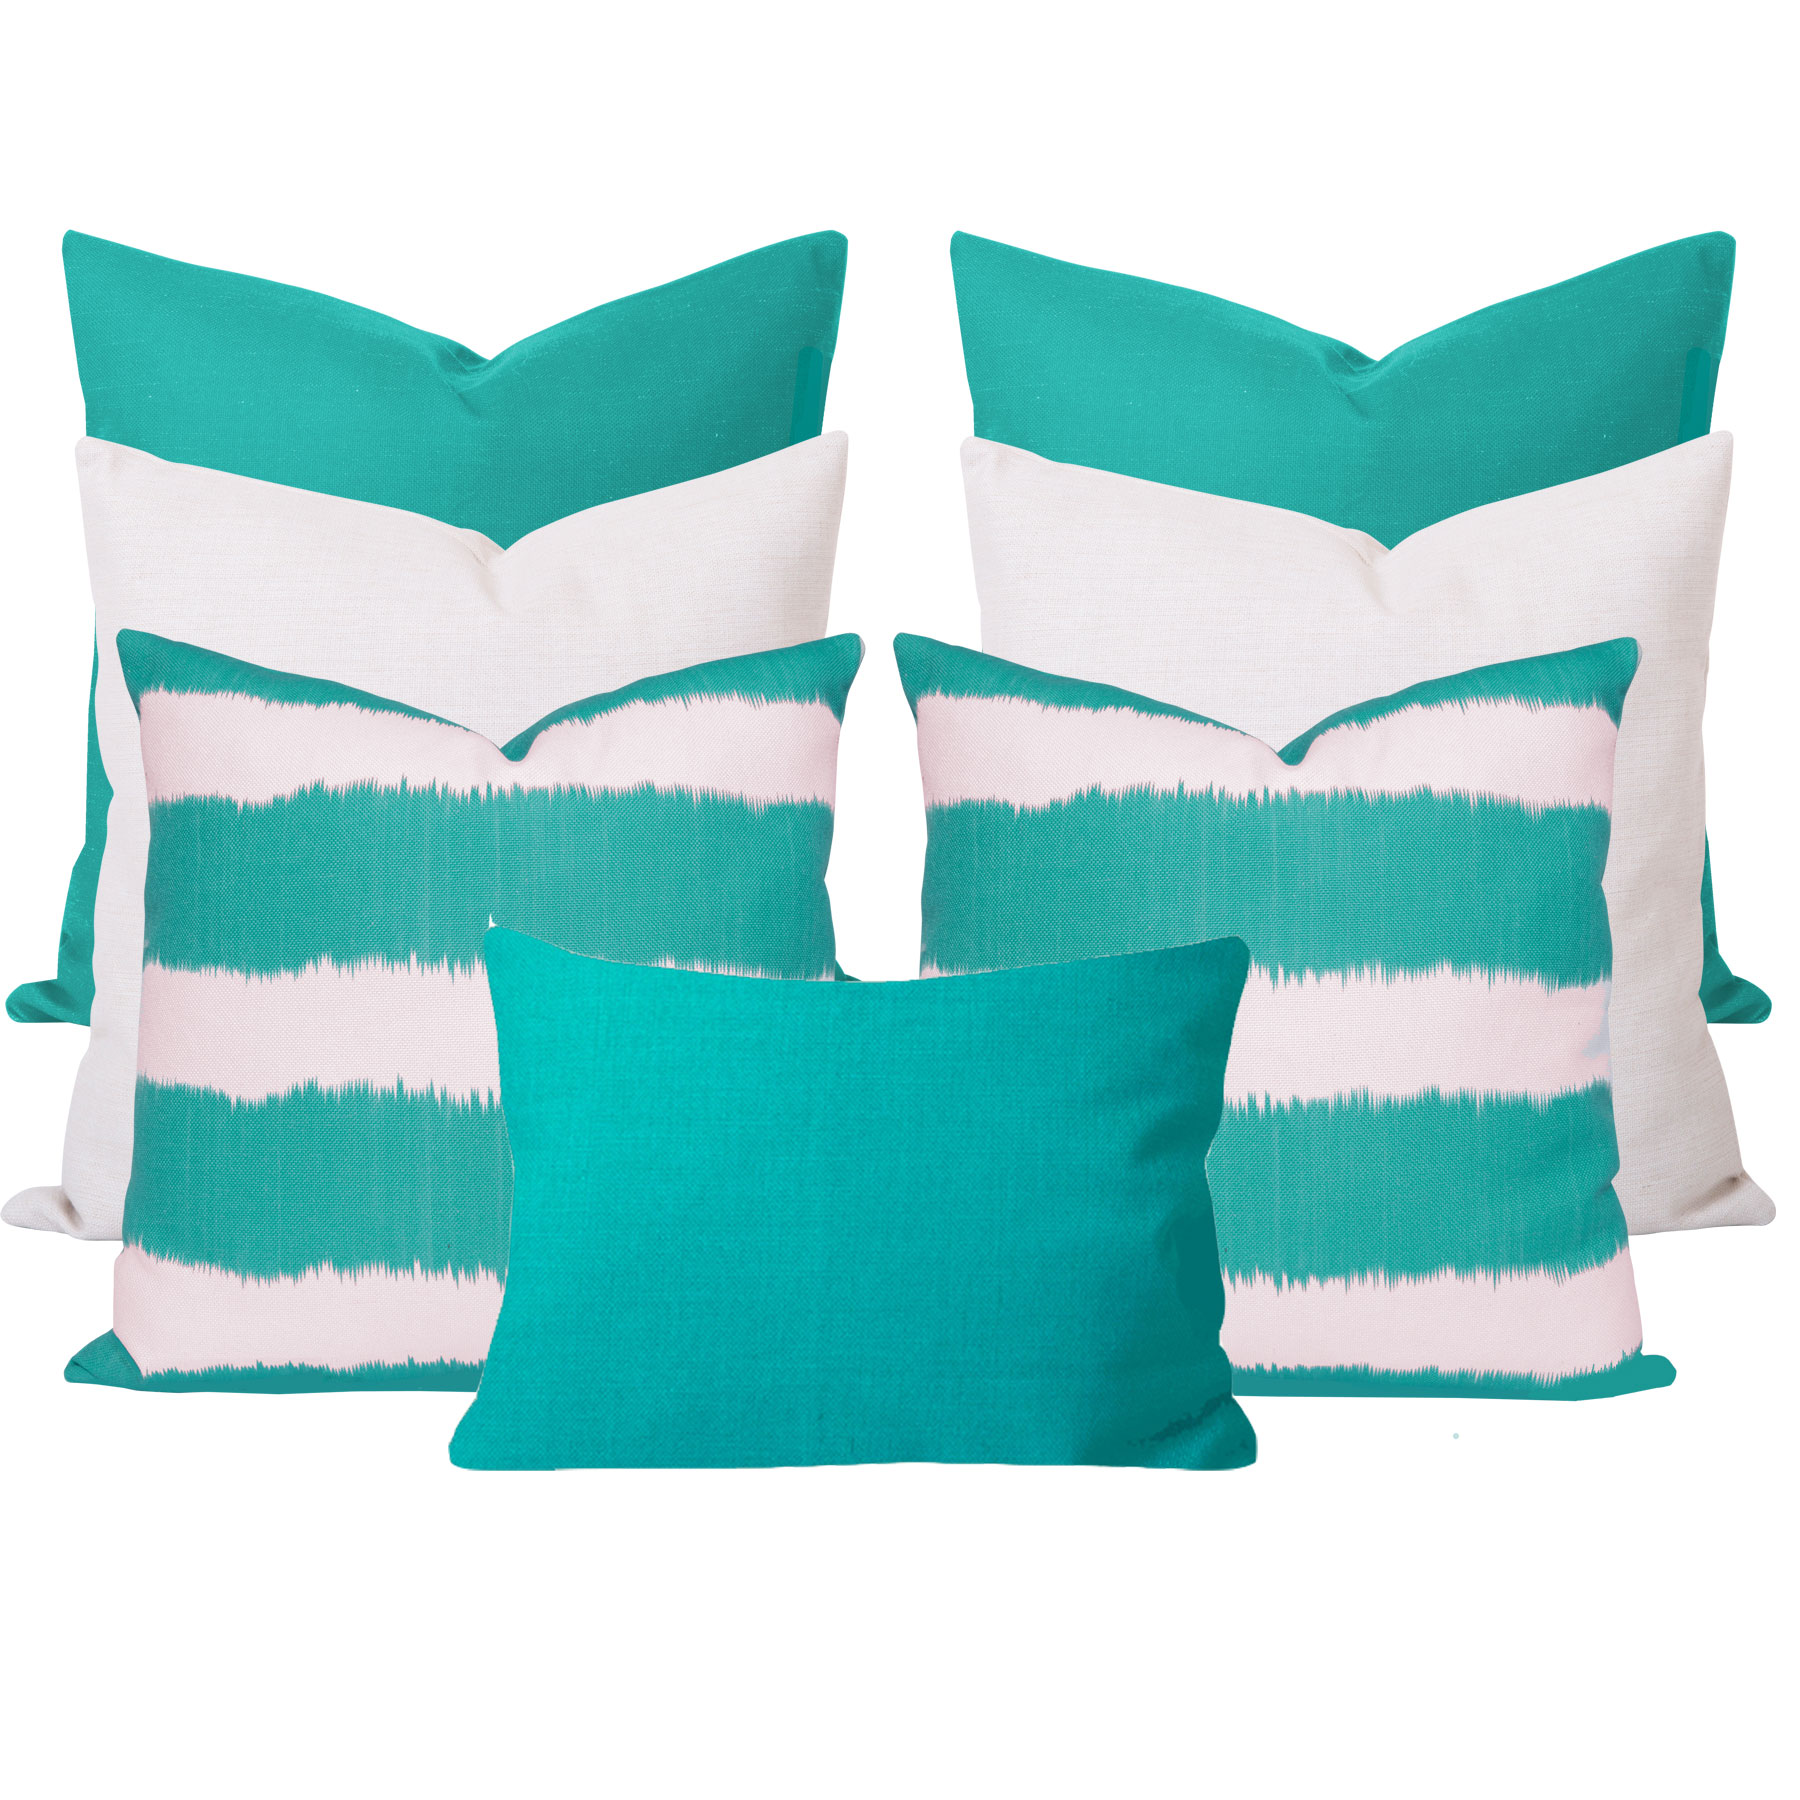 Bayou-Georgia-Turquoise-7-Cushion-Set